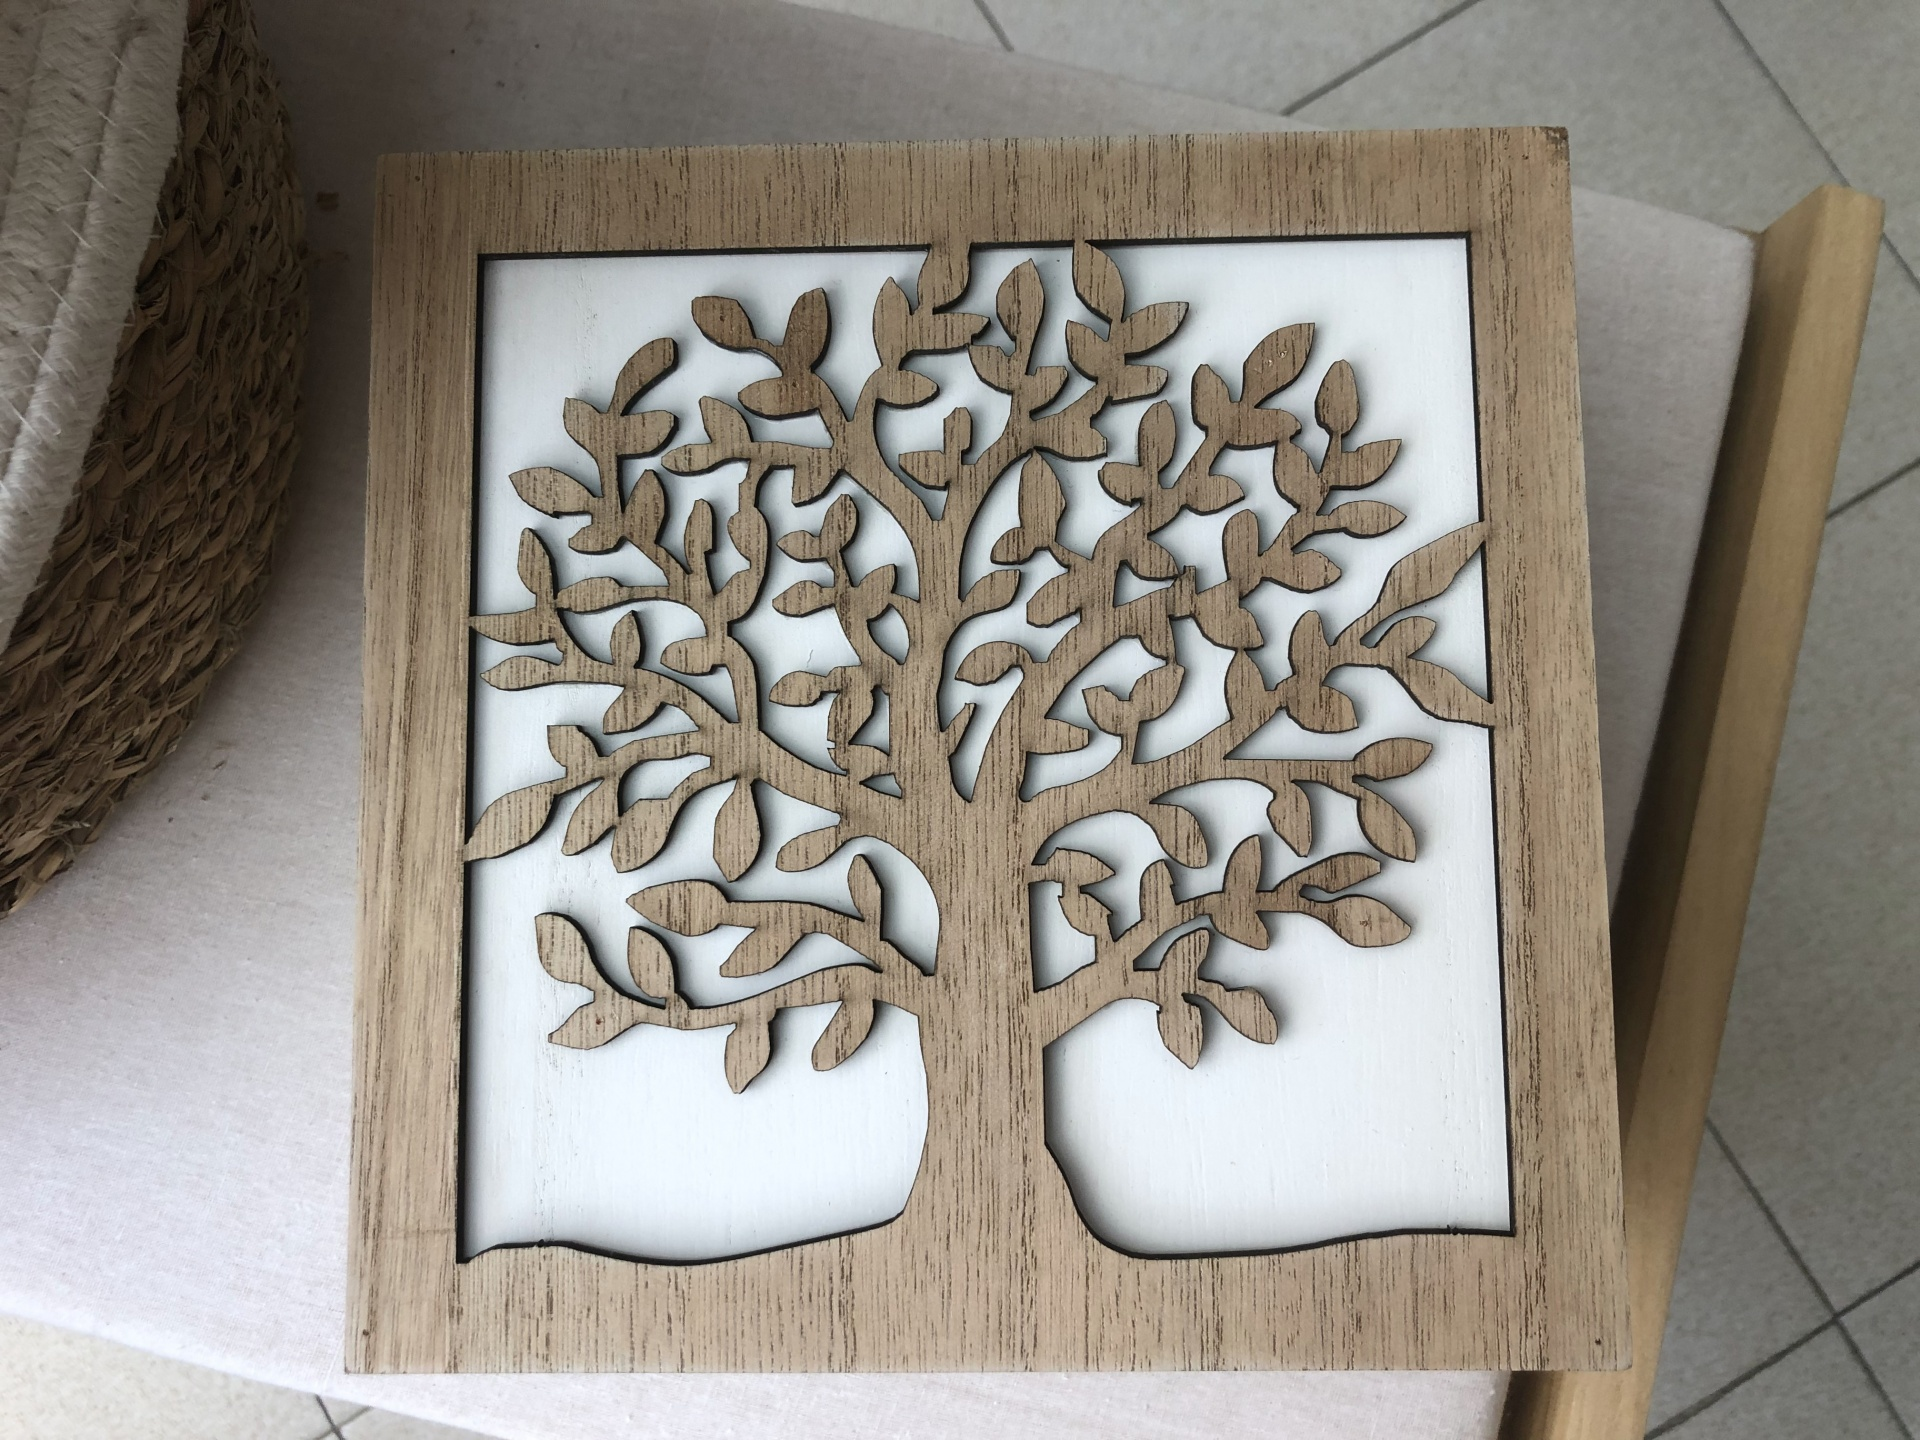 Caixa multiusos árvore da vida